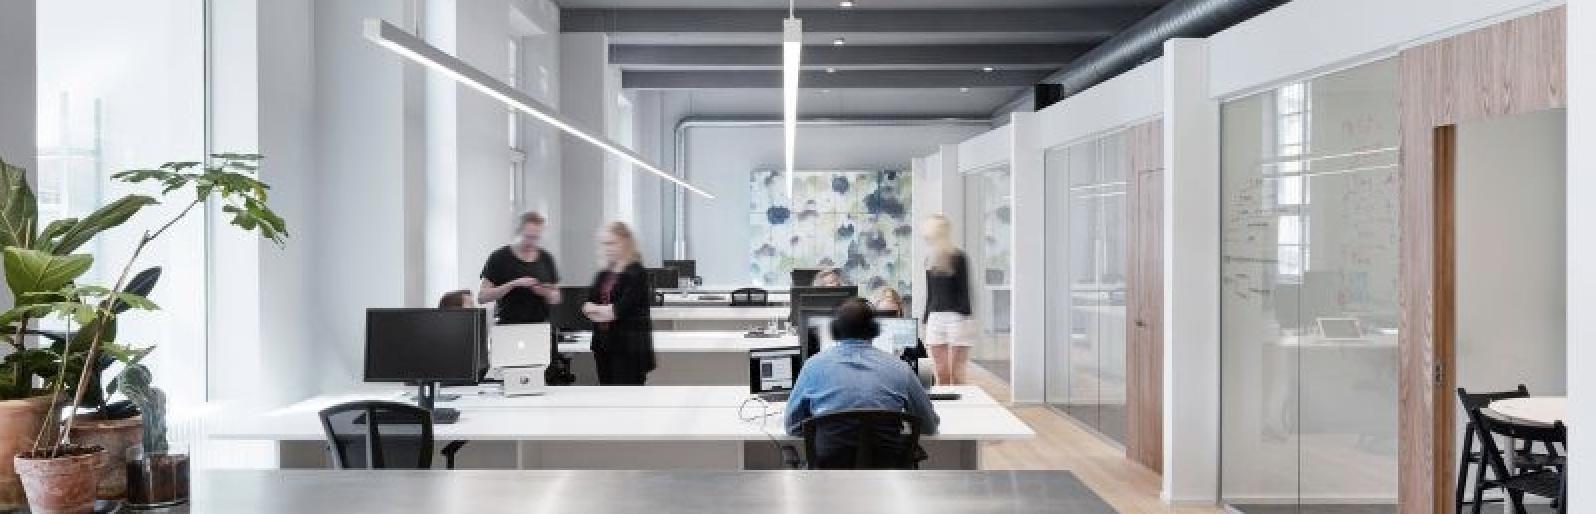 Whispr Group Office Stockholm